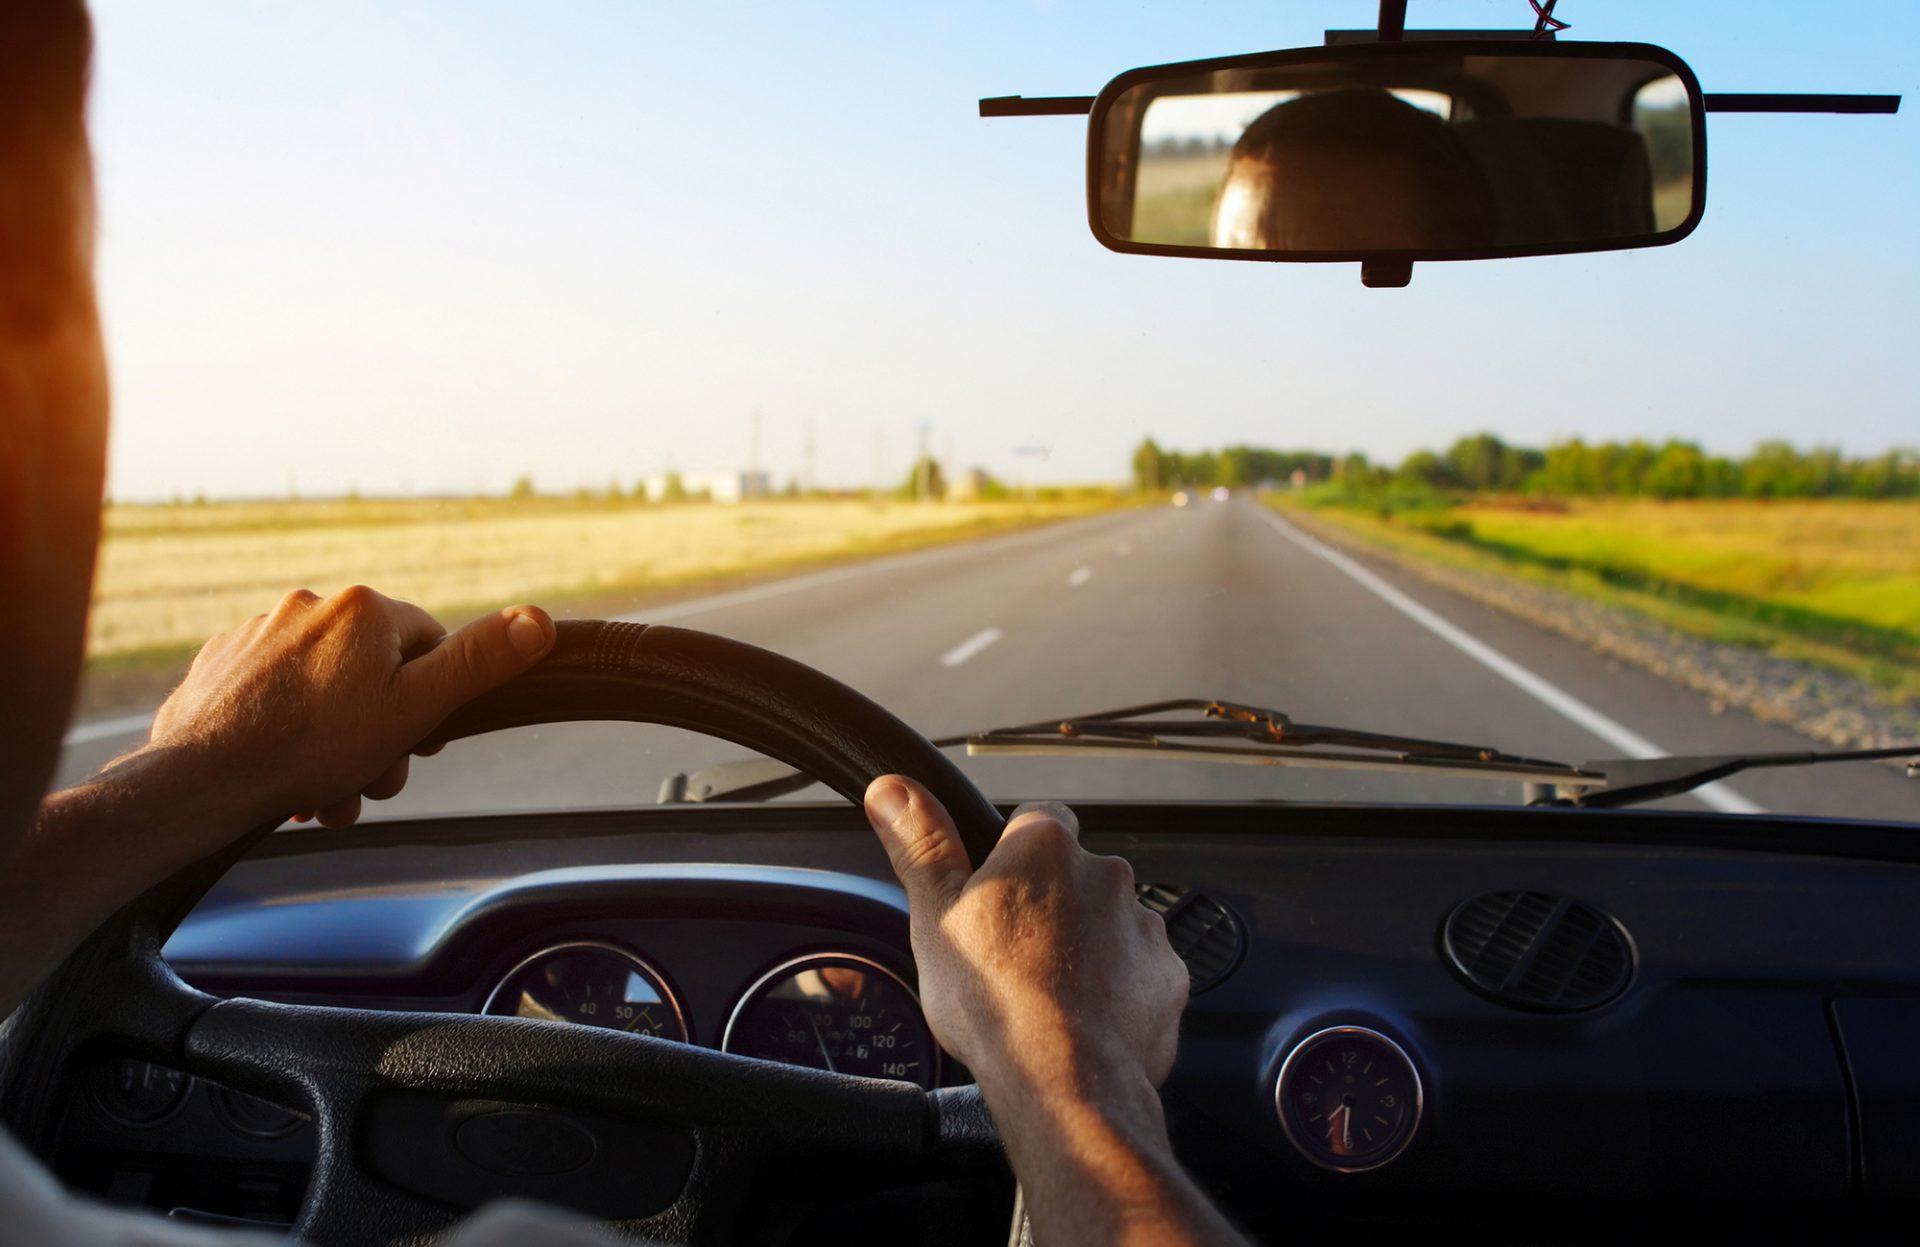 apneu cbr rijbewijs